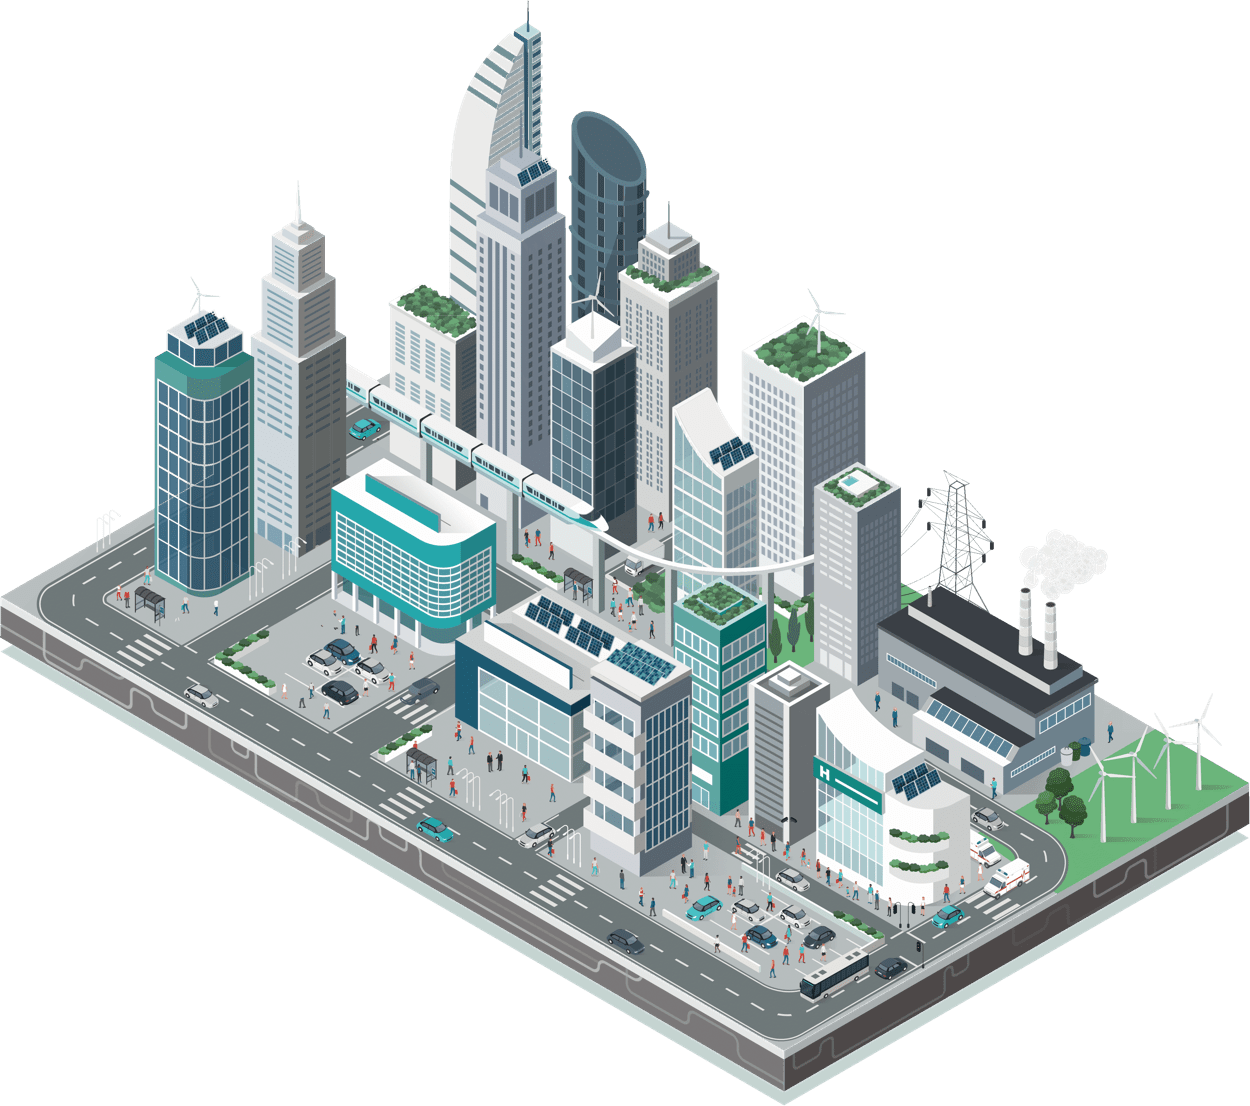 Hero-city-illustration